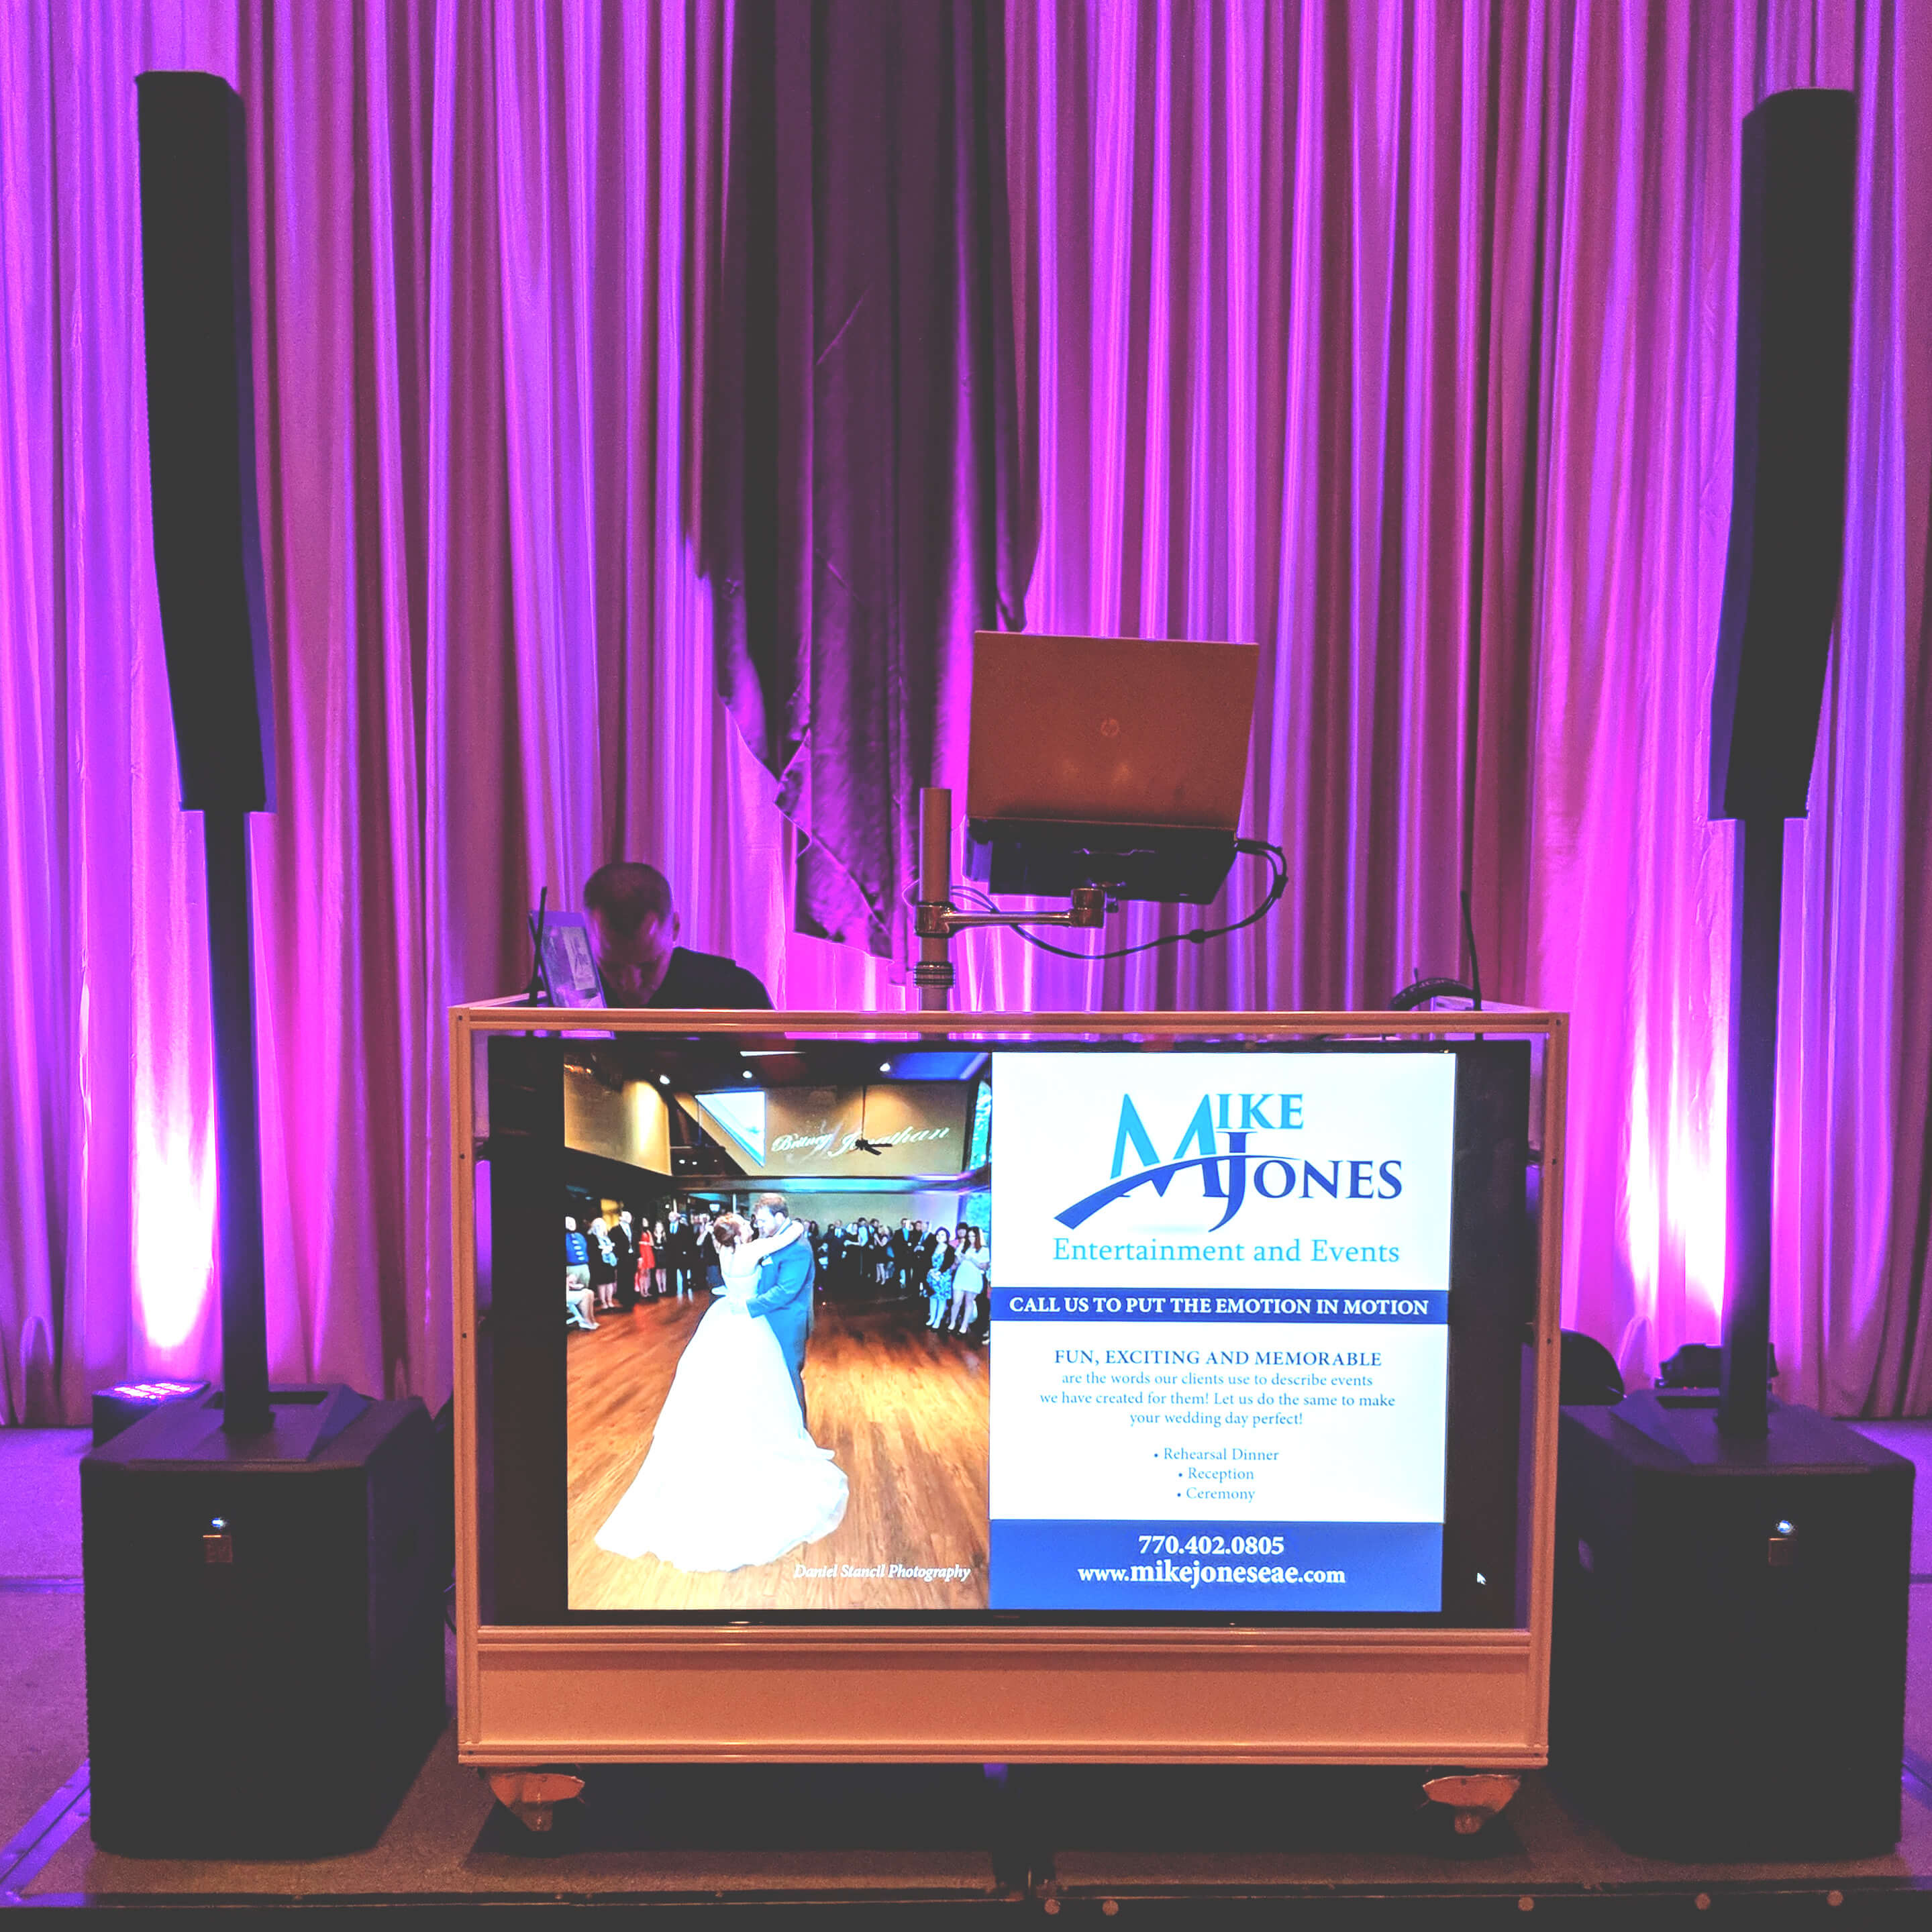 Mike Jones Entertainment and Events   Custom Video DJ Facade